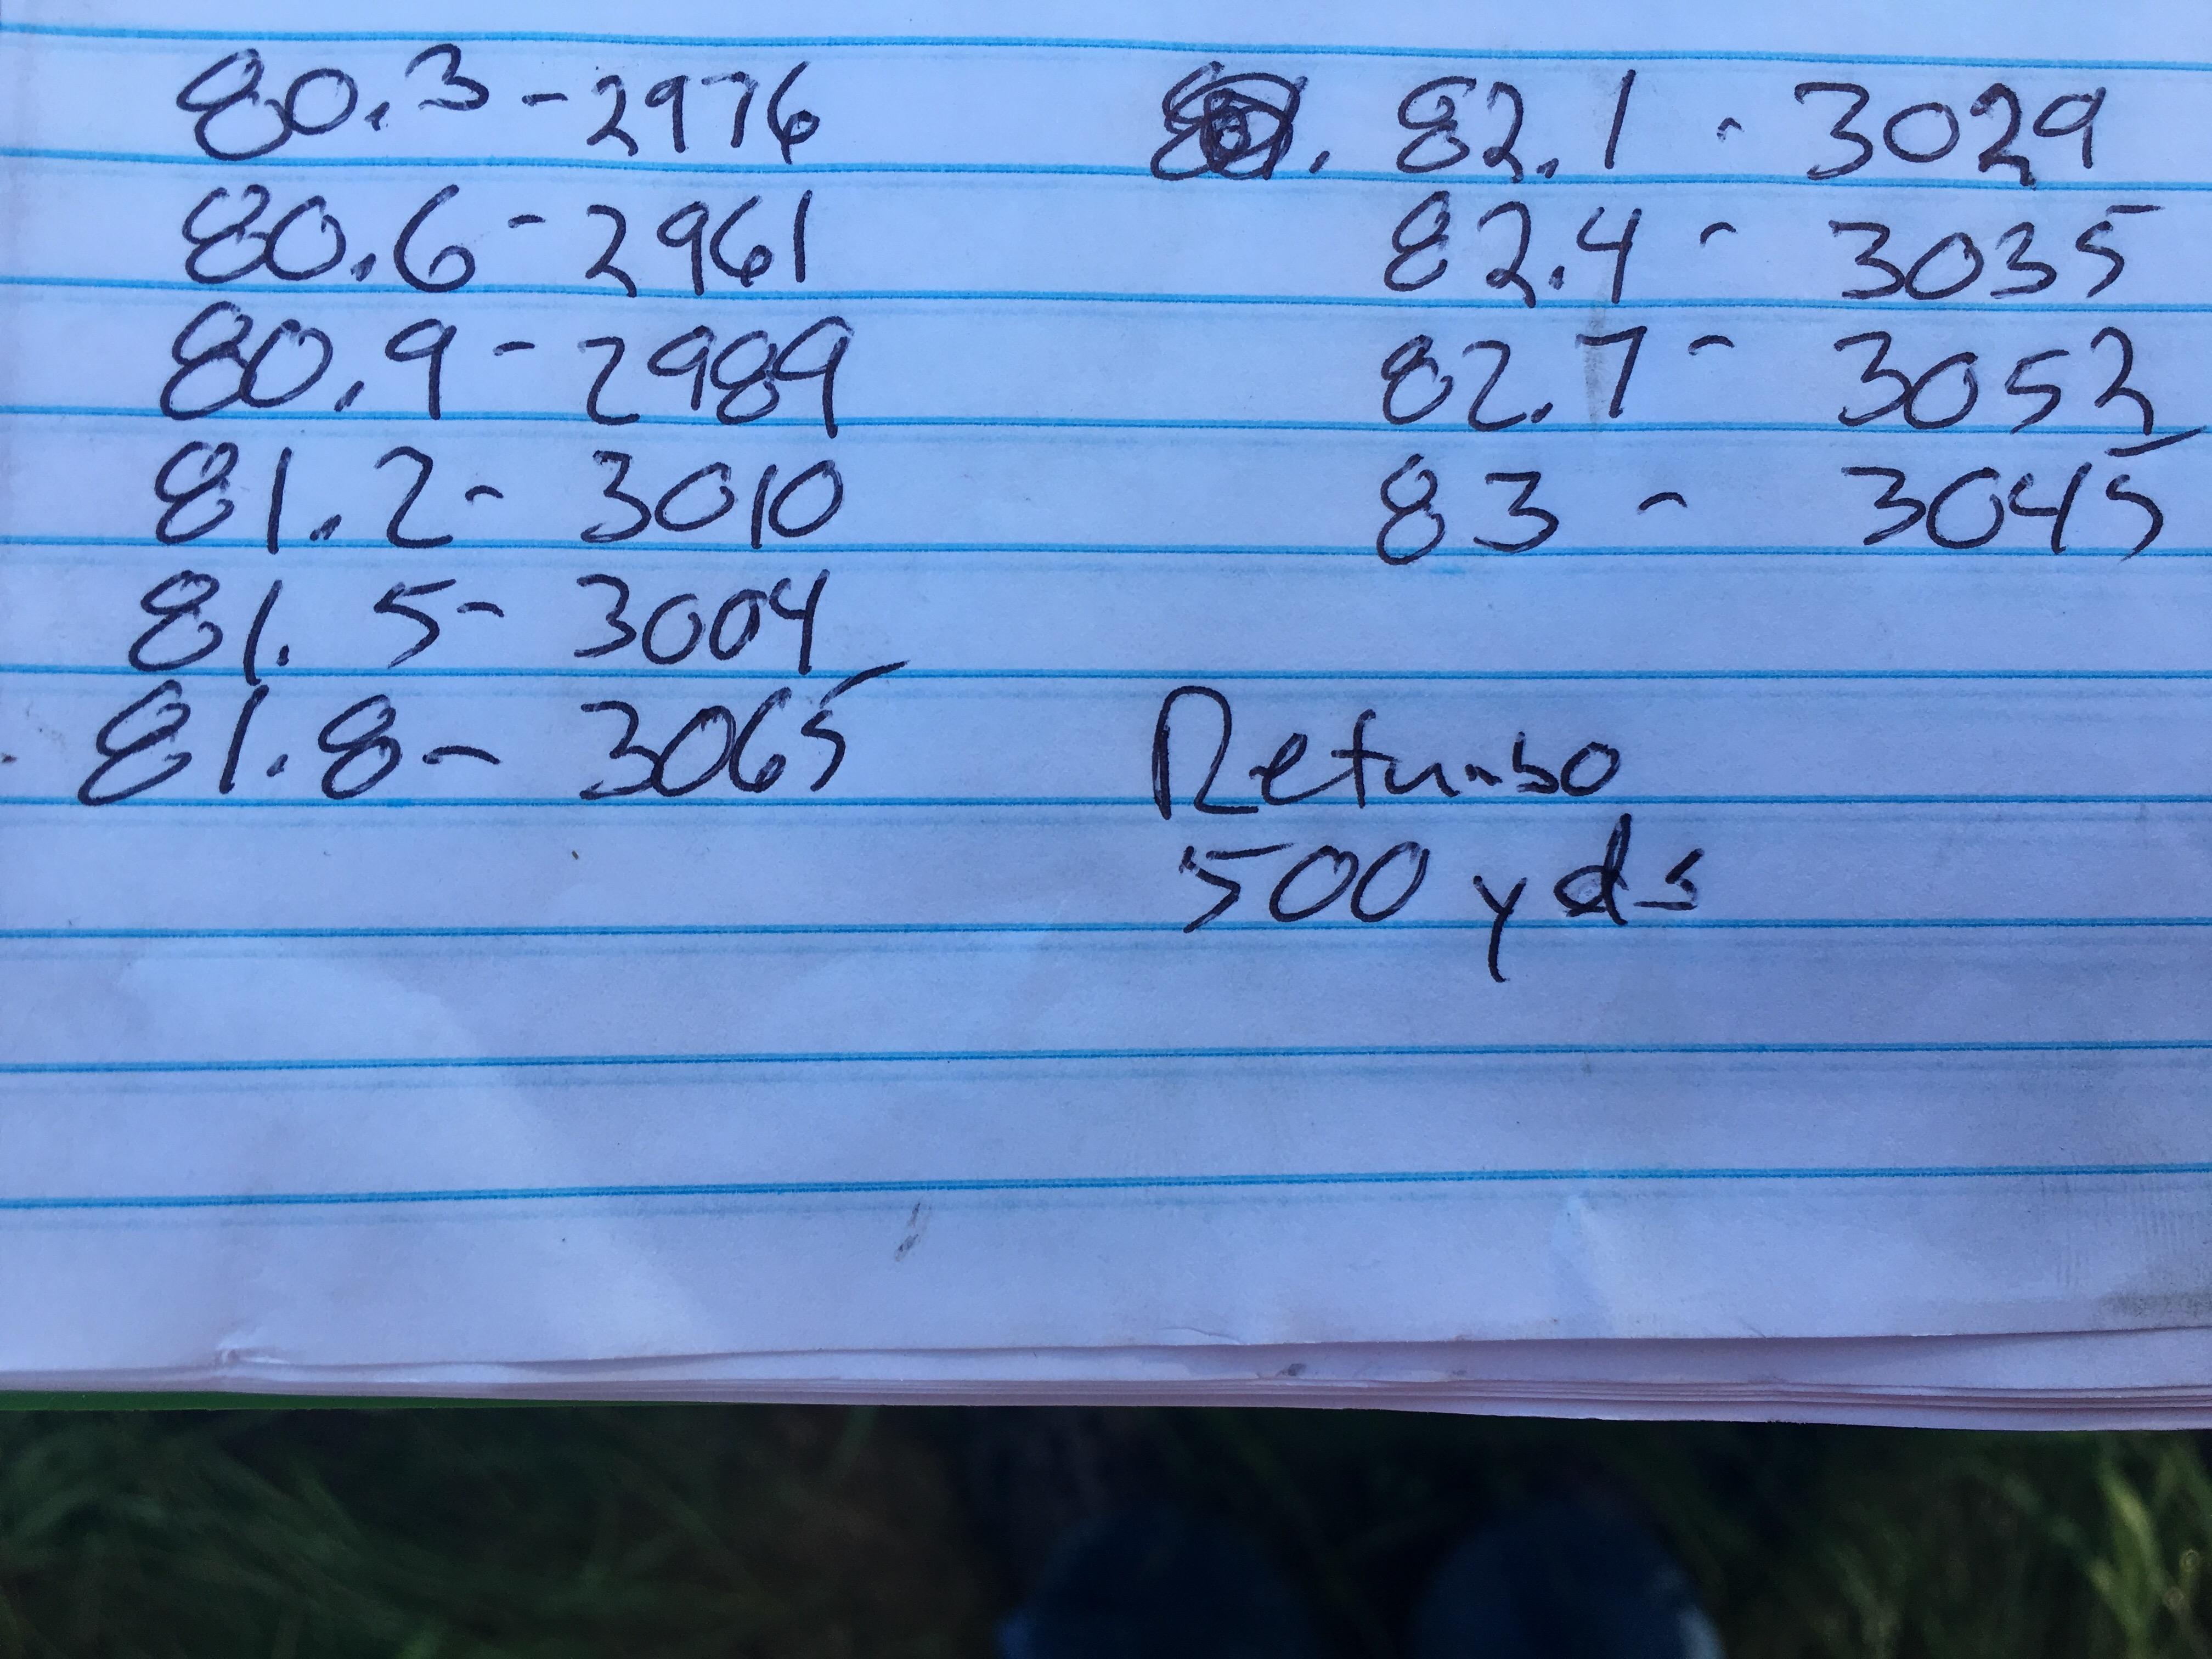 28 Nosler - Ladder Test Results | Long Range Hunting Forum